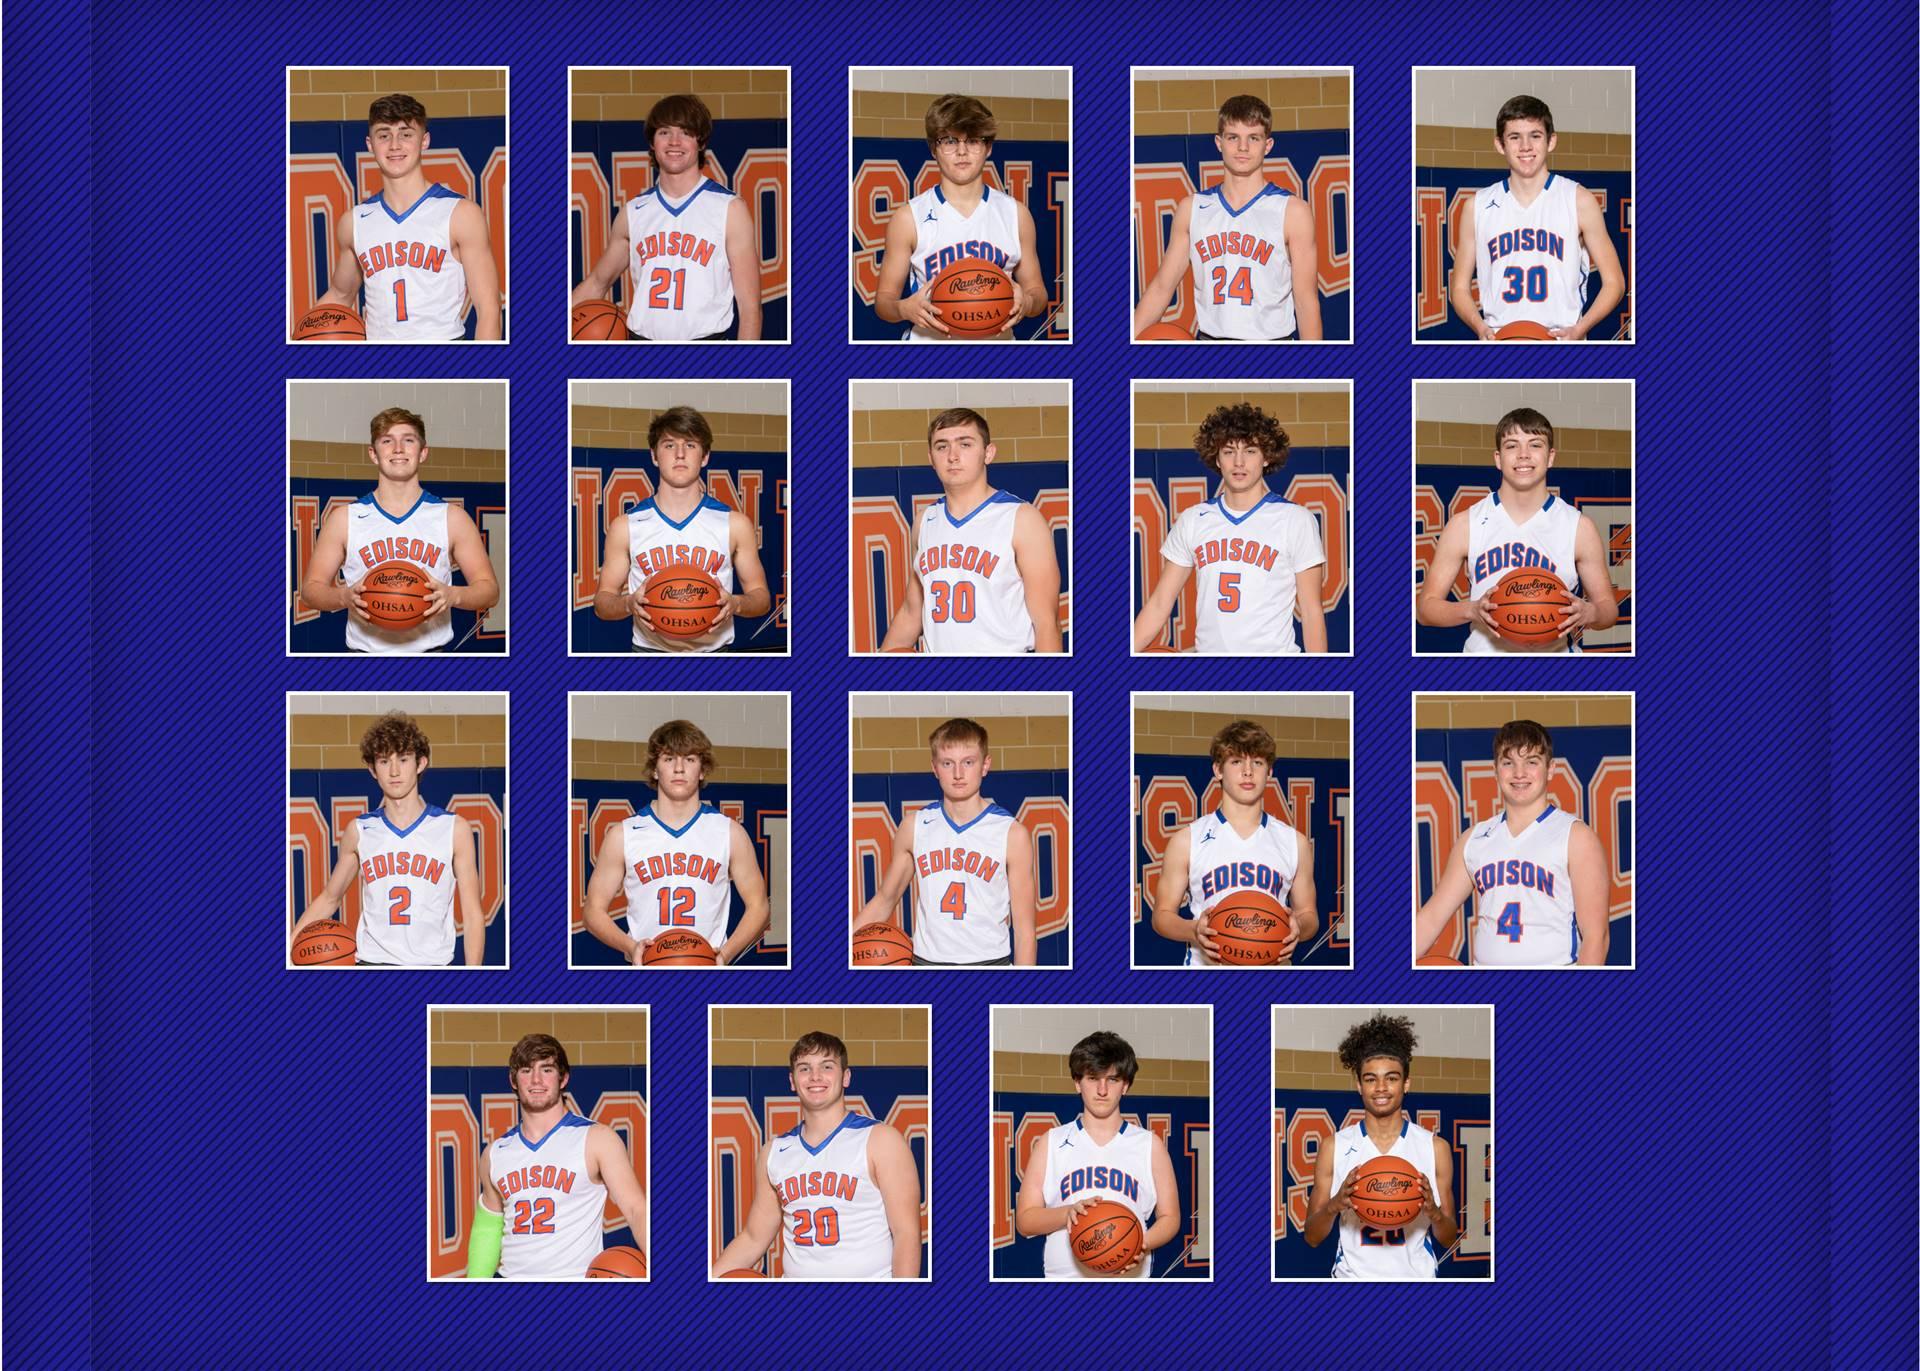 2020-21 Charger Basketball Team